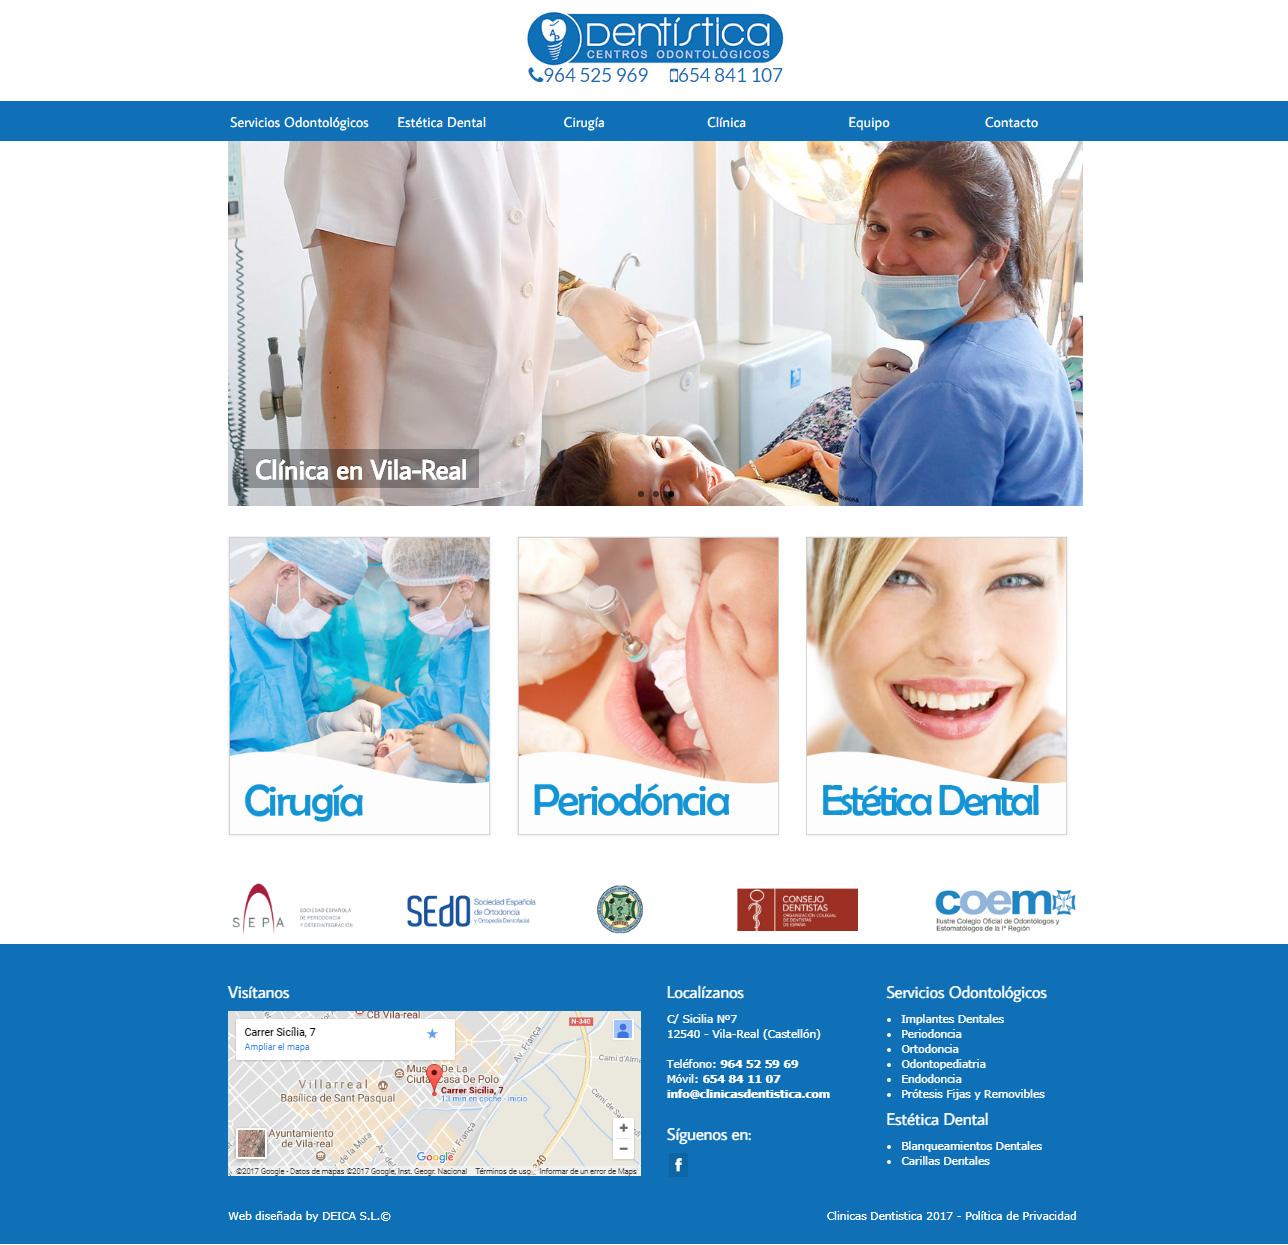 Nueva Web www.clinicasdentistica.com, diseño Parallax para móvil +SEO +Autoadministrable